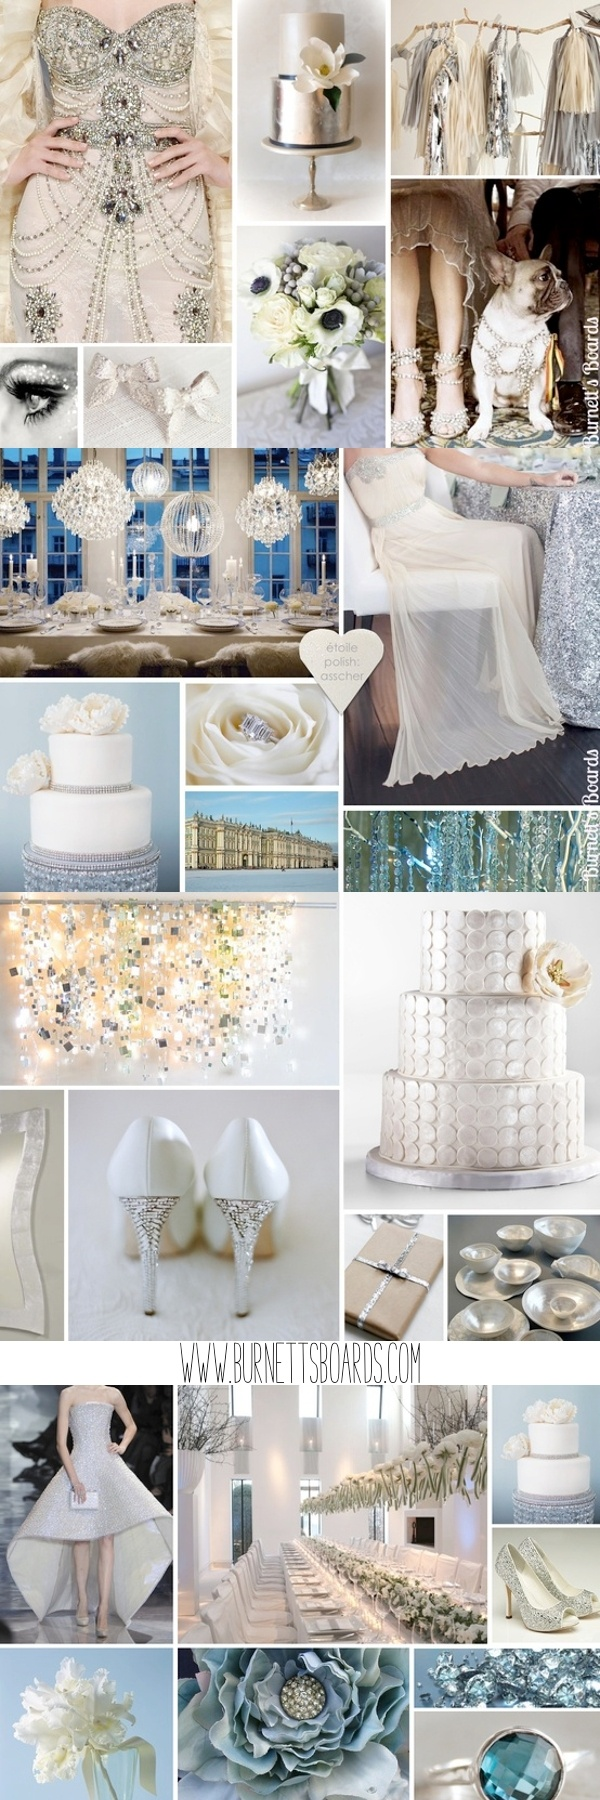 Silver wedding inspiration http://burnettsboards.com/category/metallics/